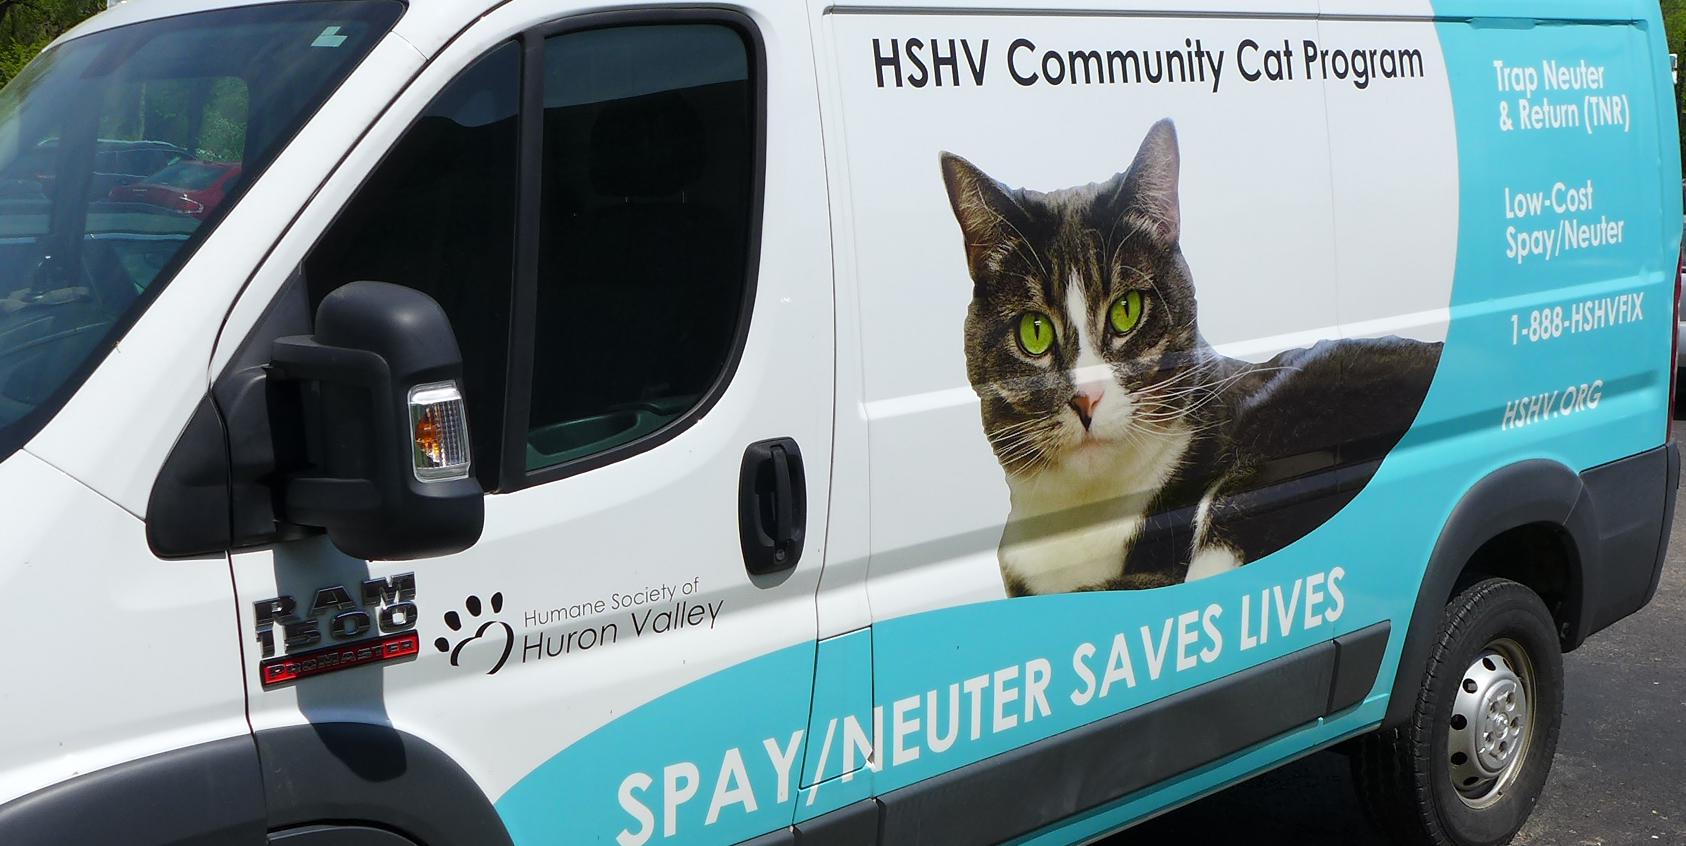 HSHV Community Cat Program van